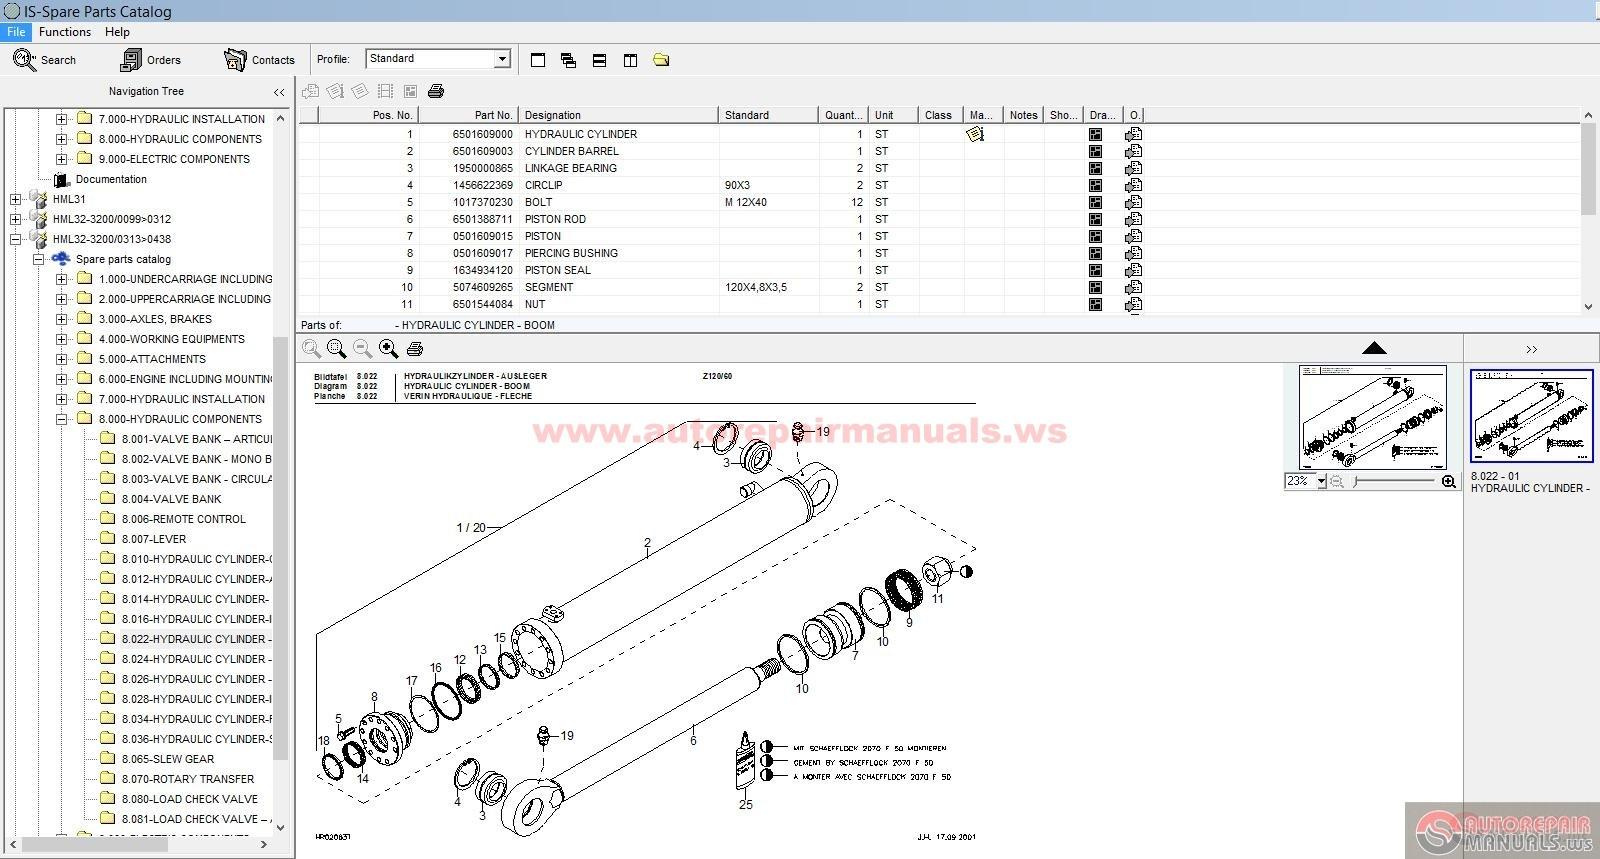 terex schaeff hml 22 23 31 32 42 parts catalog auto. Black Bedroom Furniture Sets. Home Design Ideas